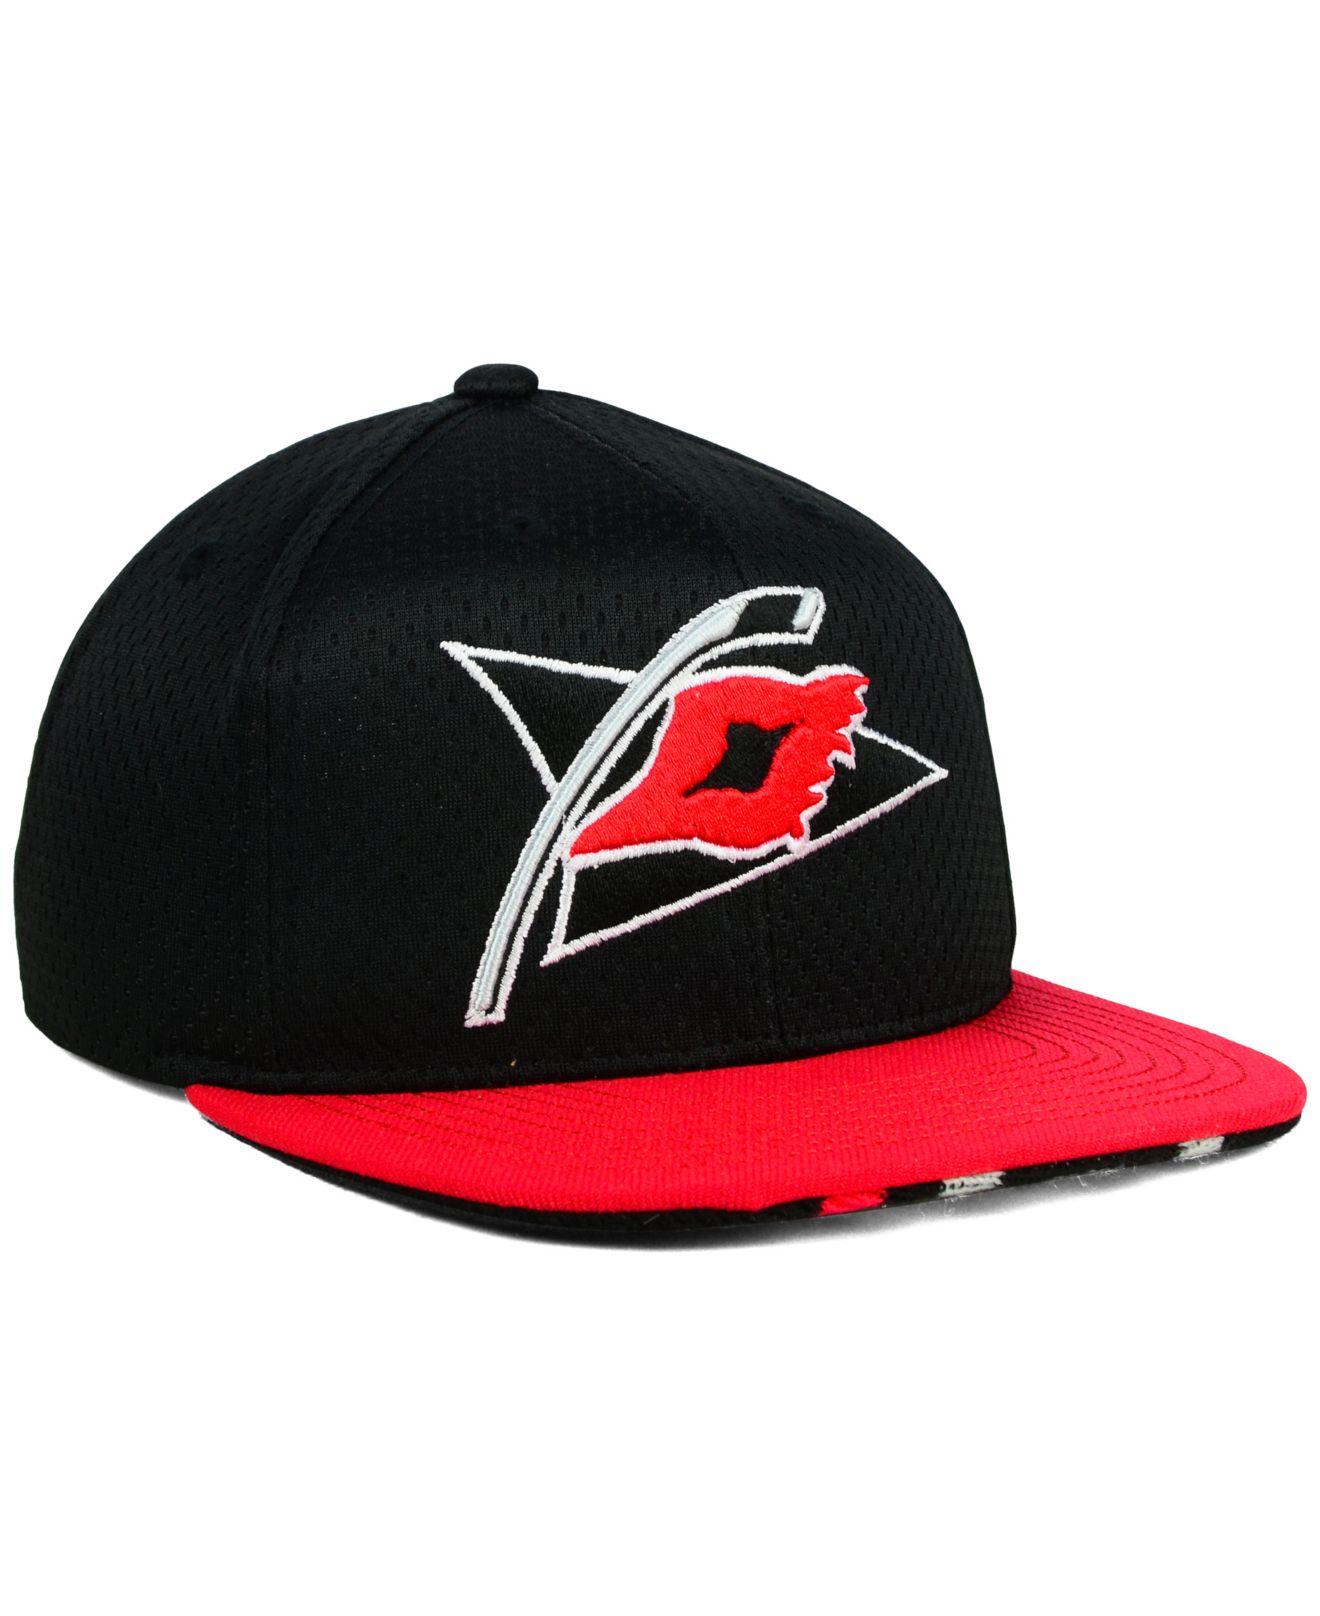 buy popular 76e58 b6abb Reebok Black Carolina Hurricanes Jersey Hook Snapback Cap for men